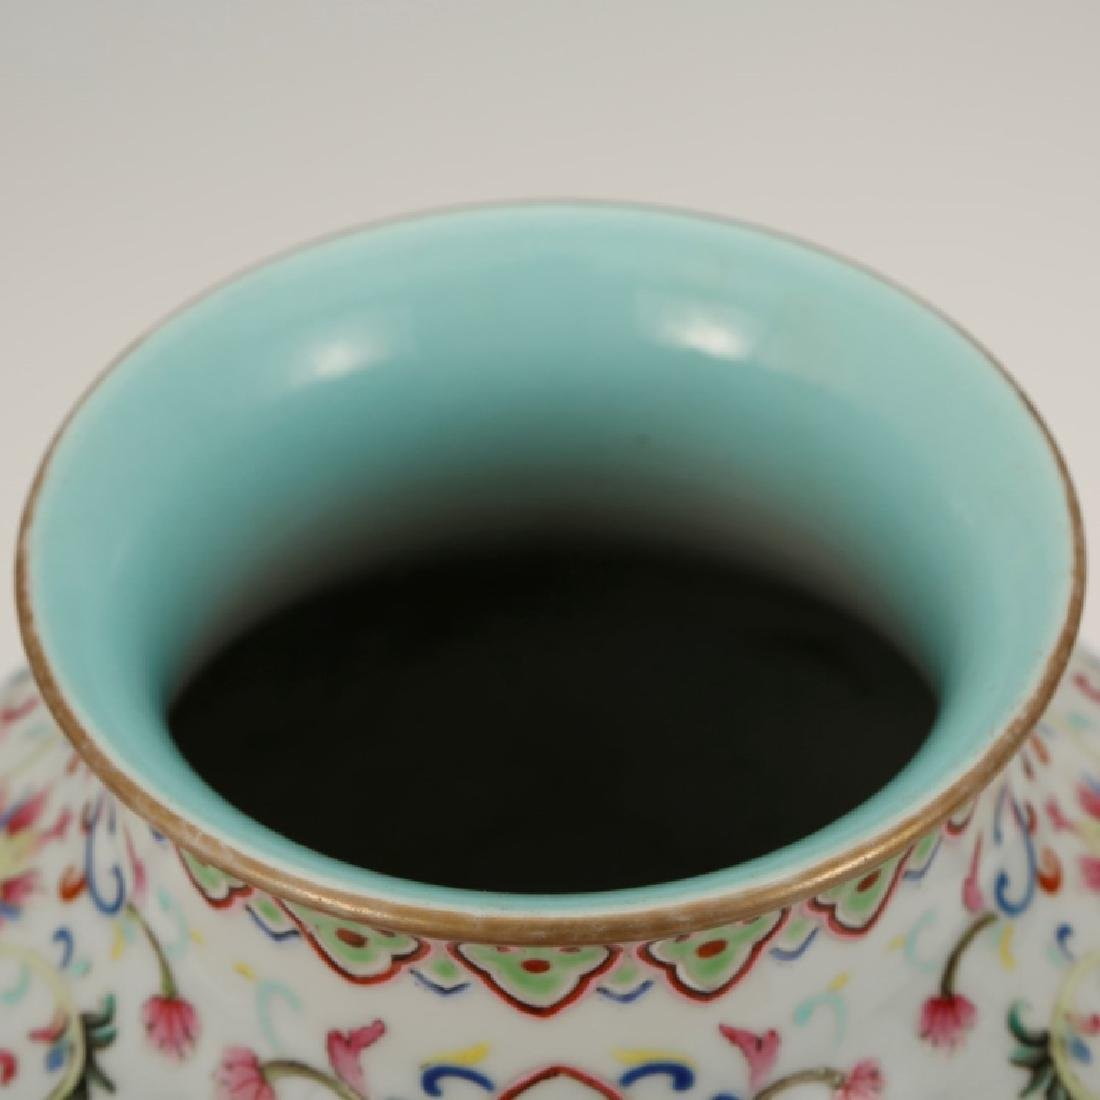 Chinese 19th C Famille Rose Enameled Porcelain - 2